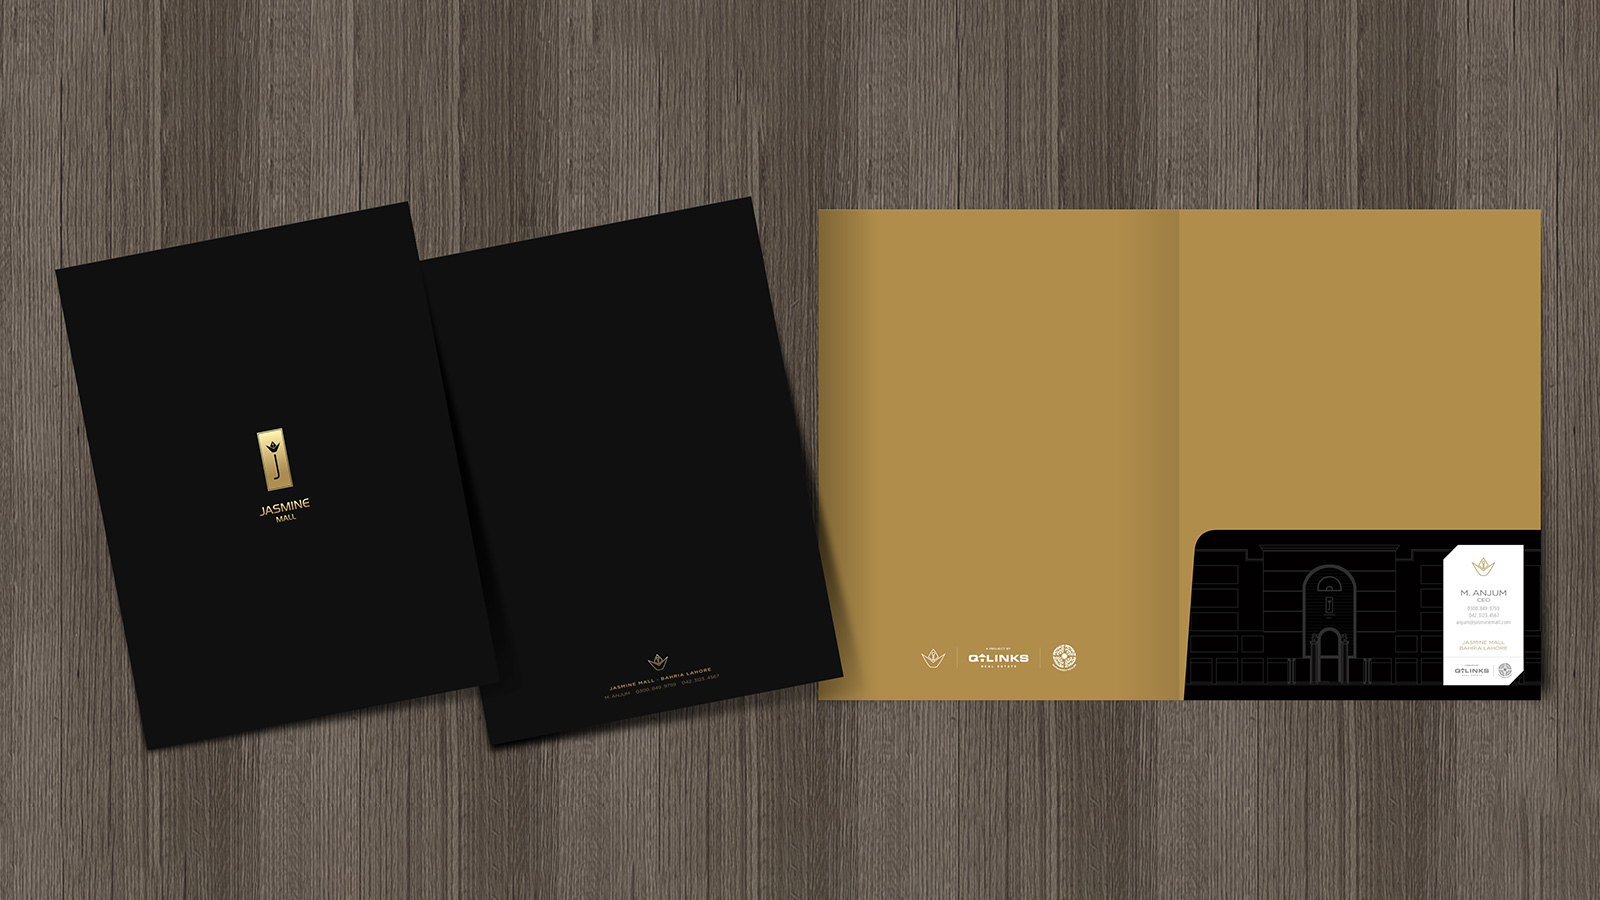 graphic-brand-design-web-designer-hiline-lahore-pakistan-jasmine-mall-004